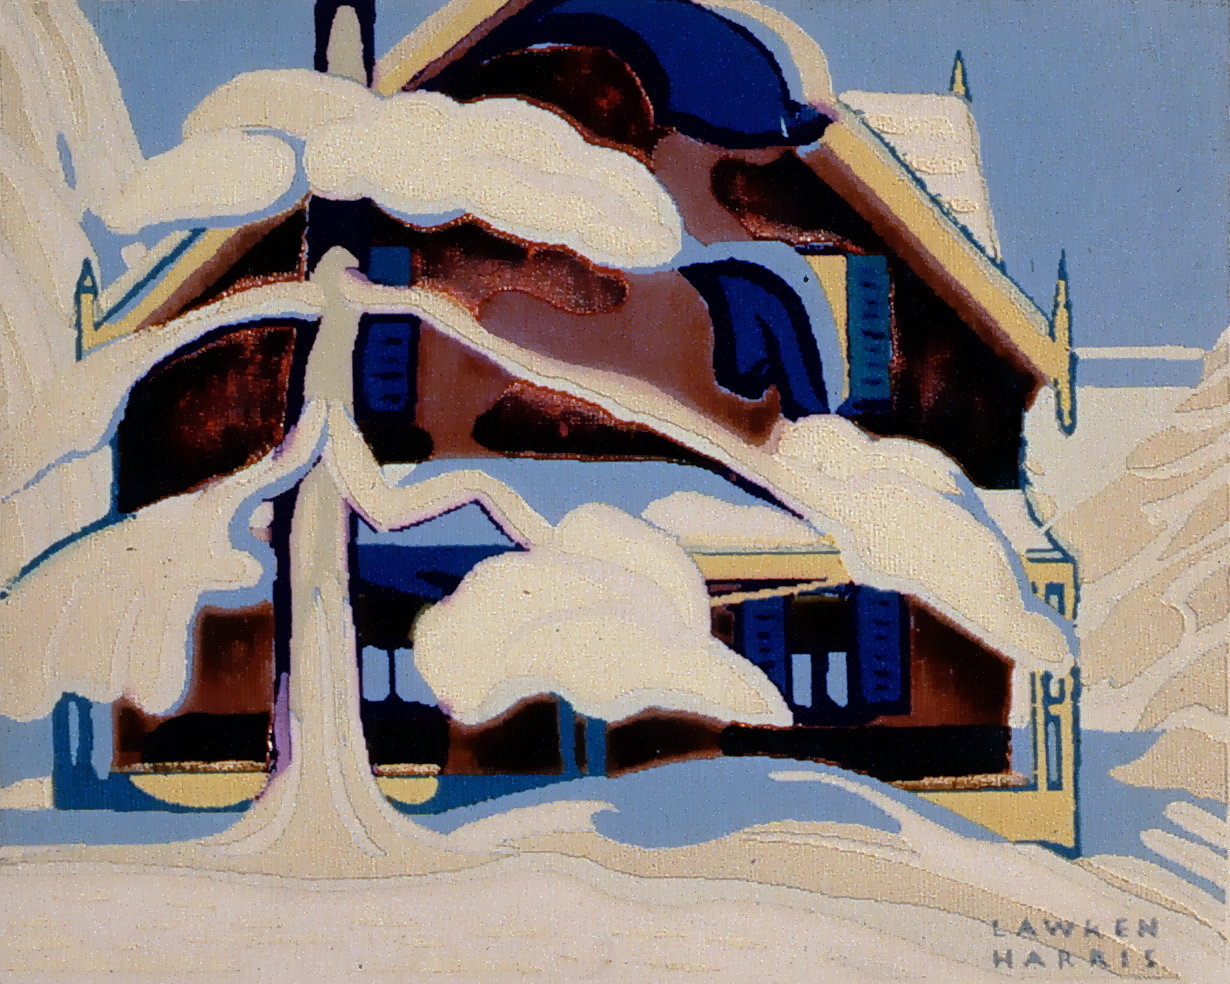 Untitled, Lawren Harris, Serigraph, 1984.01.12